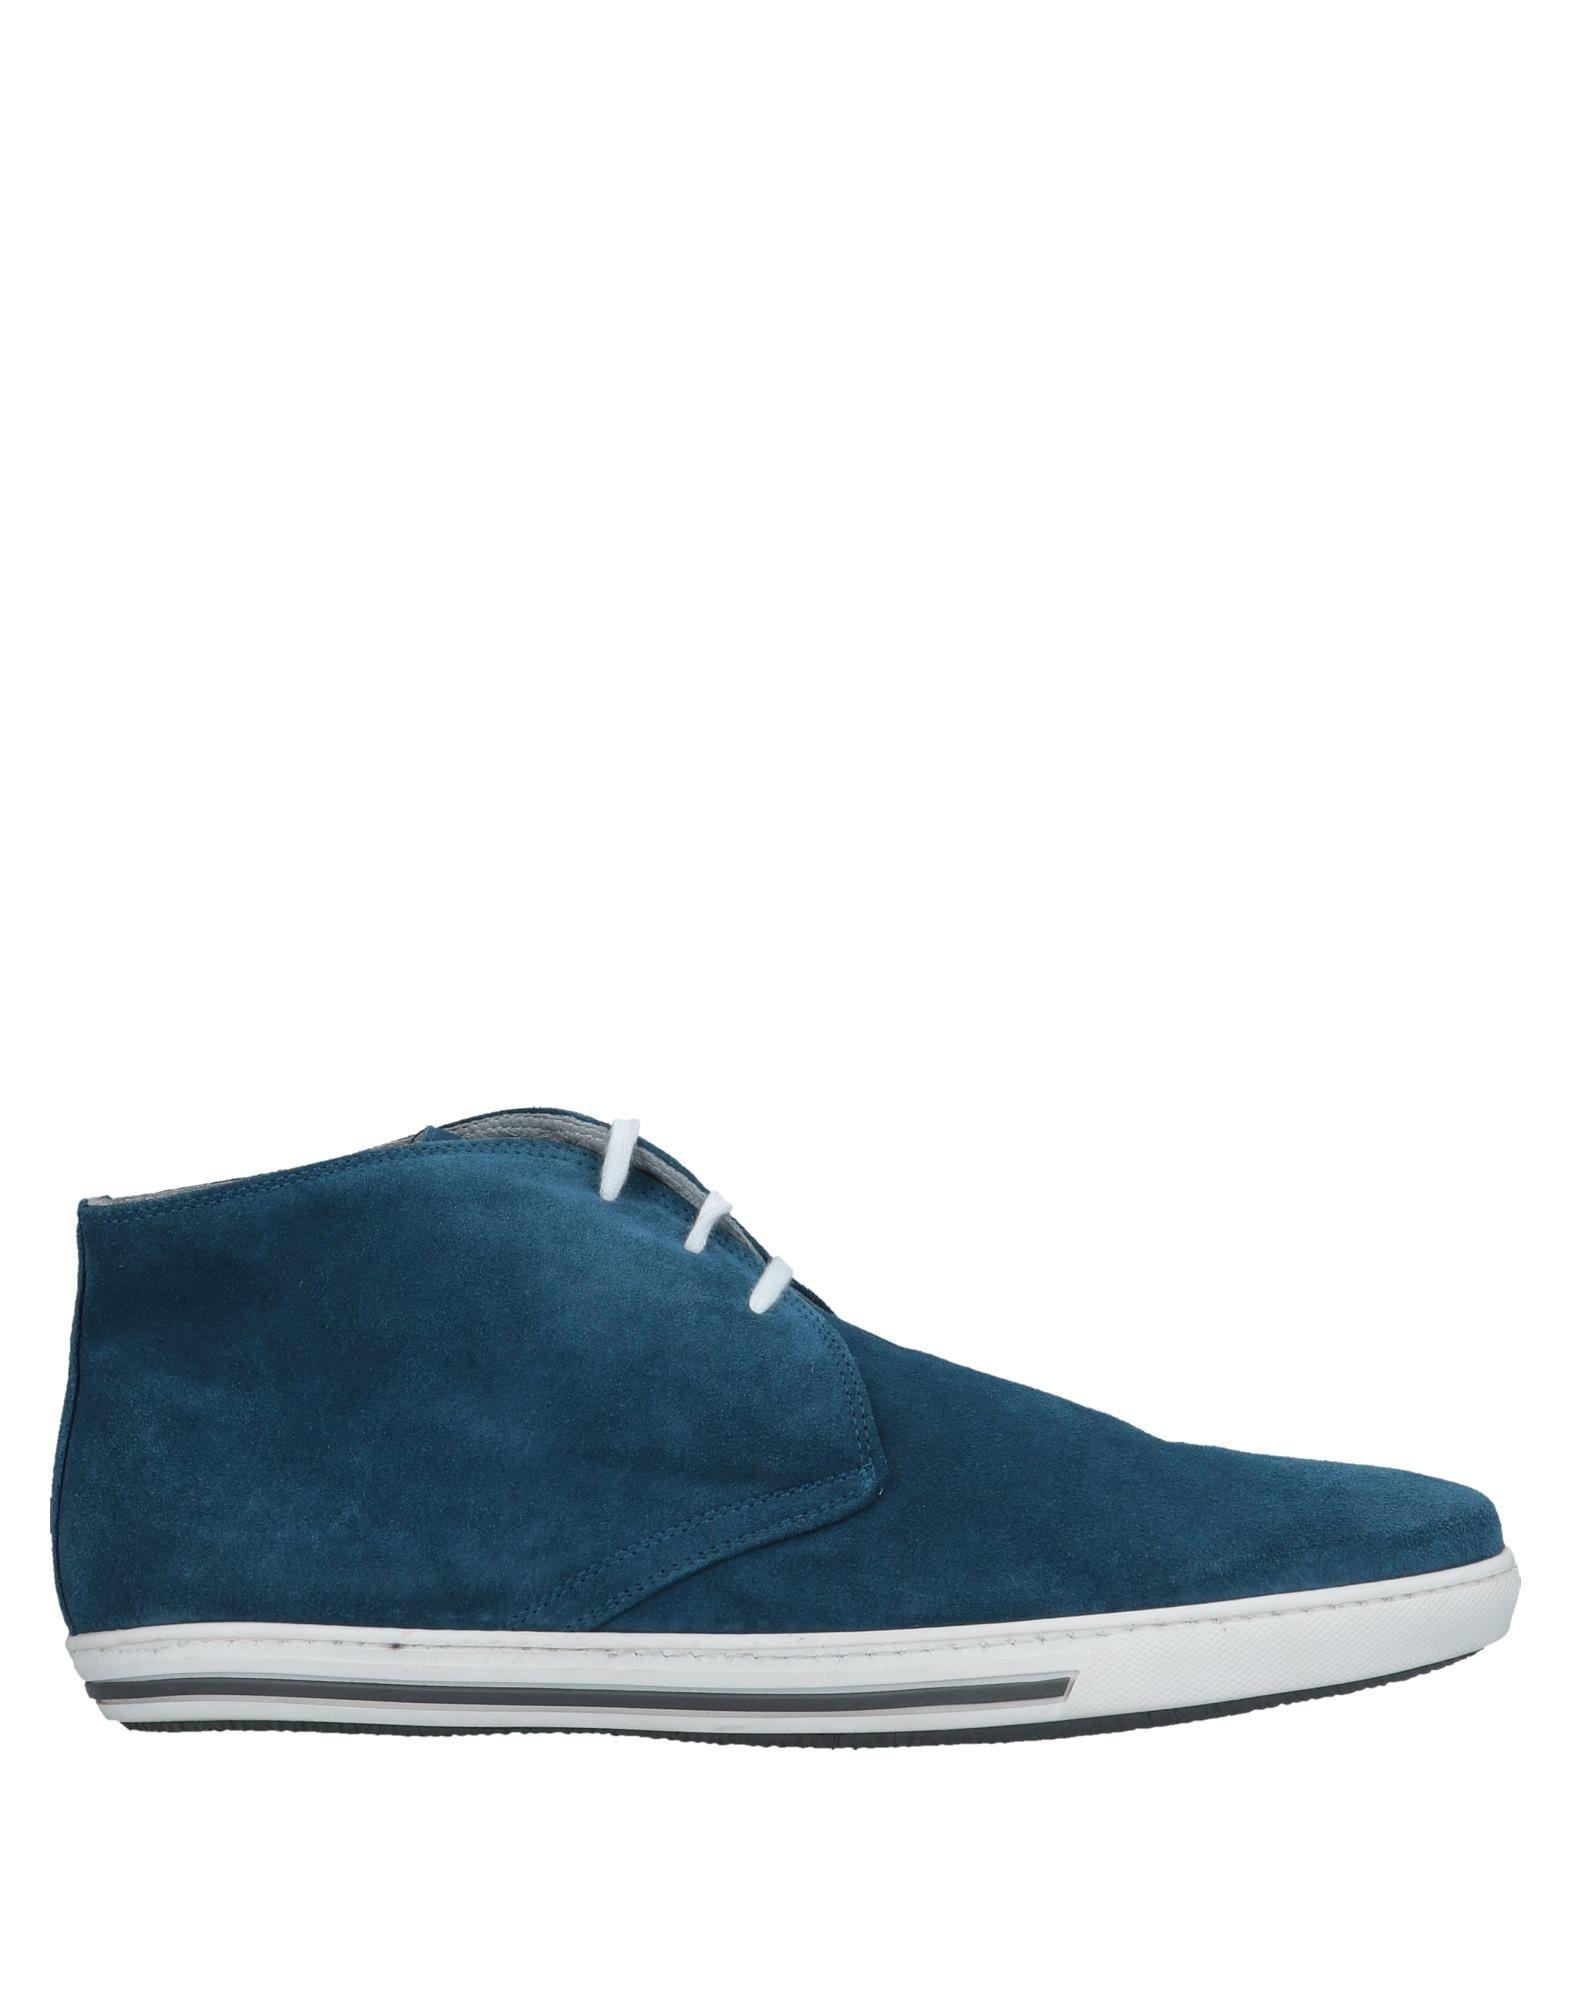 Enrico Fantini Sneakers Herren  11554420EK